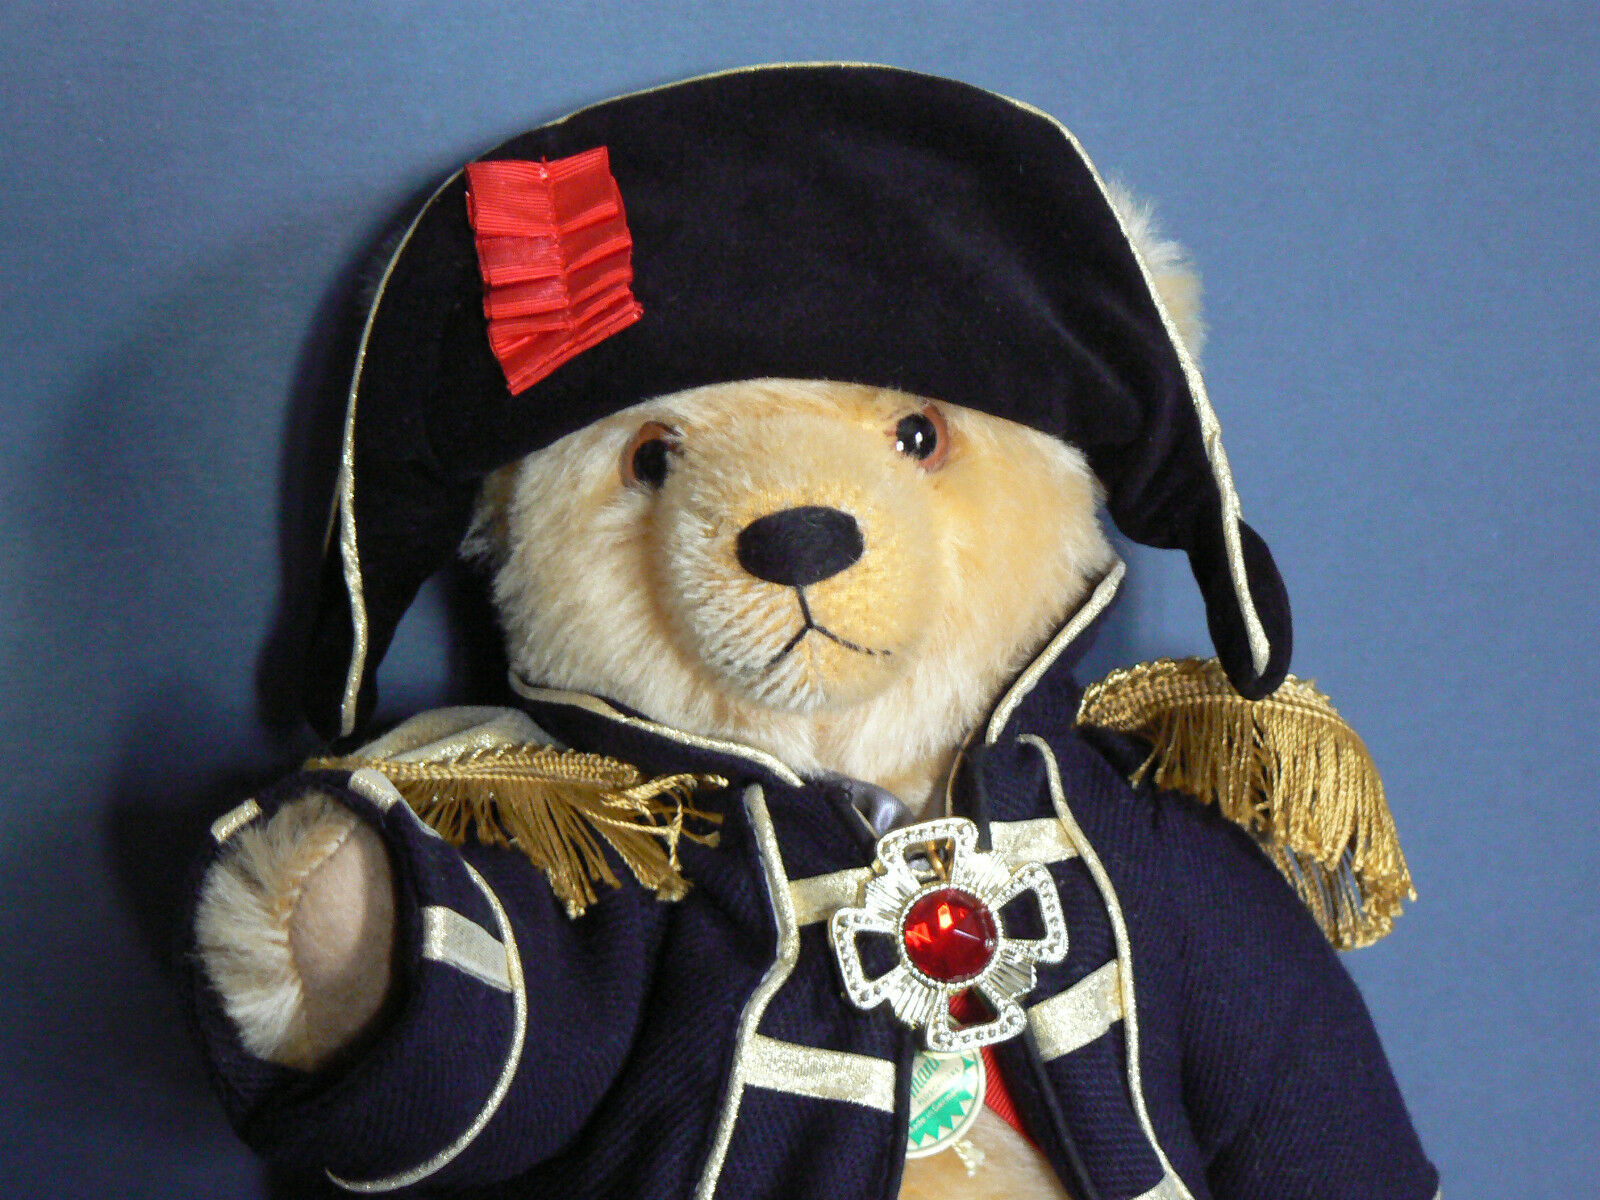 Heruomon Lord Nelson Teddy Teddy Teddy 37 cm stata limitata 107 500 pezzi c37162